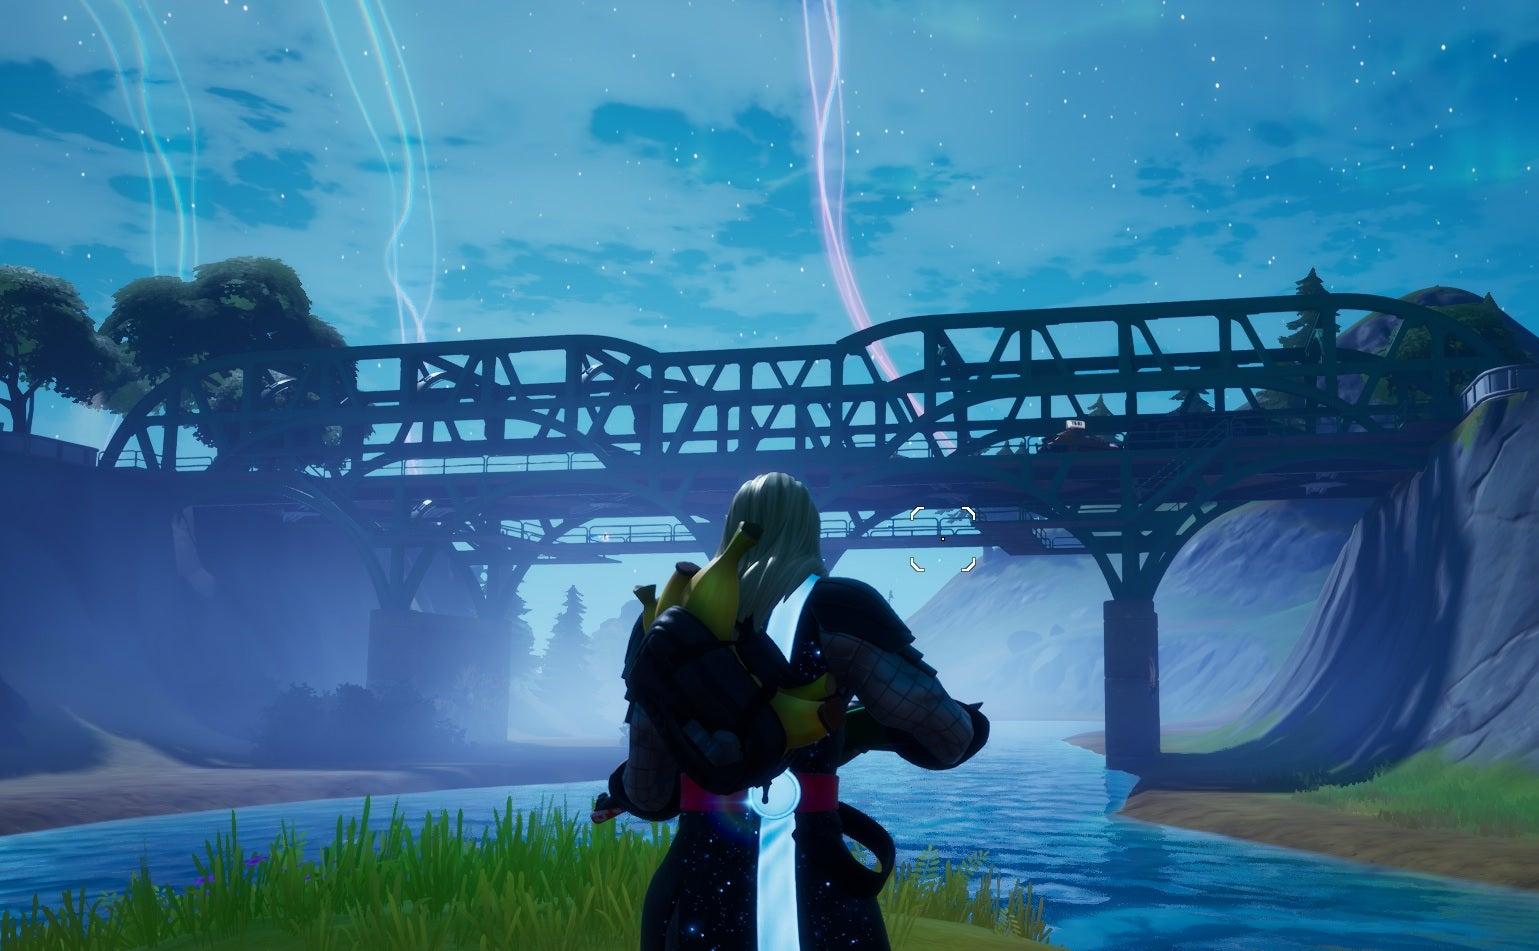 Image for Fortnite: Chapter 2 Season 4 - Ride a Motorboat under different coloured steel bridges